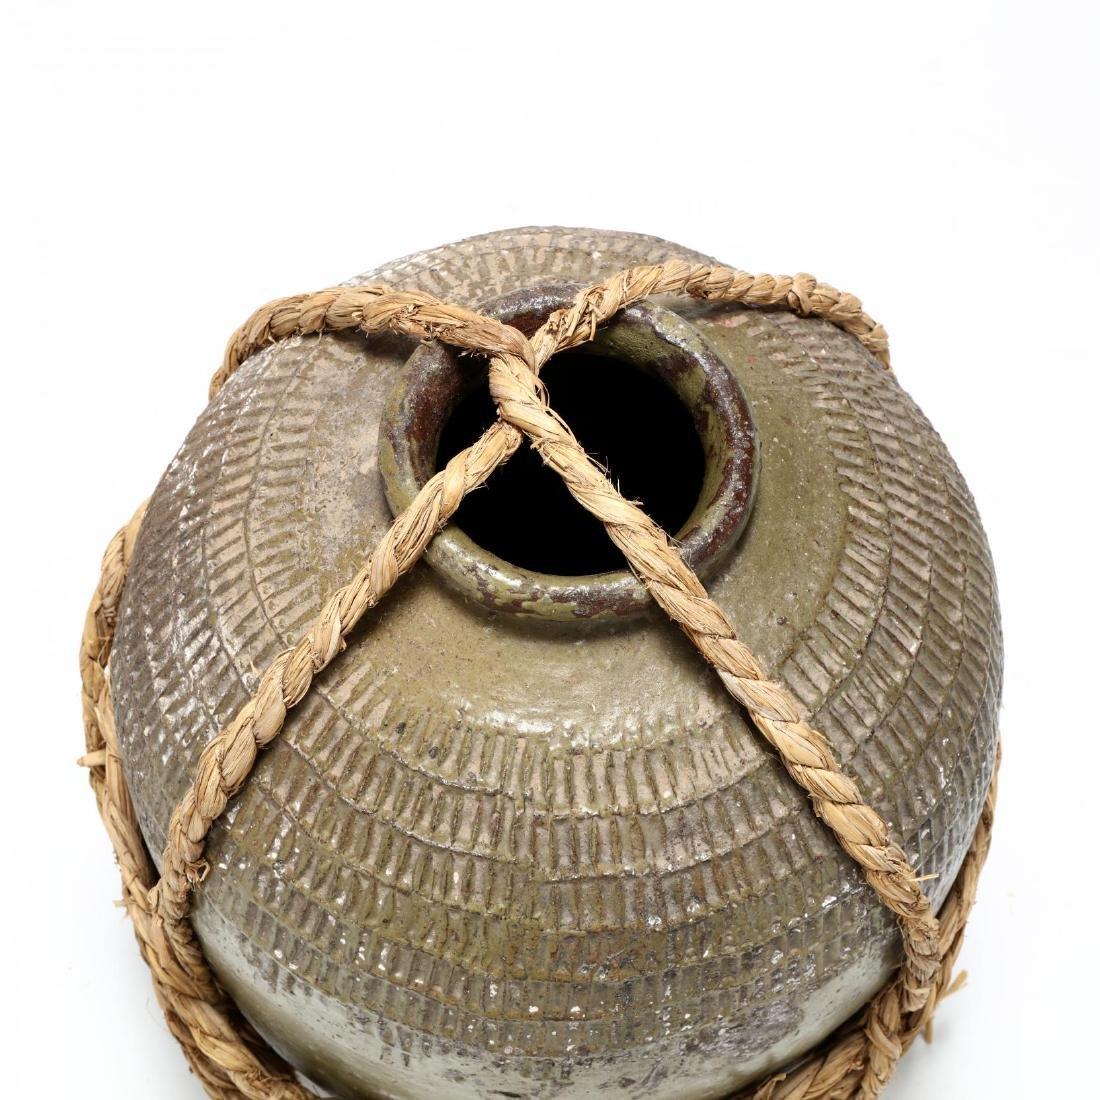 A Balinese Pottery Water Jug - 2